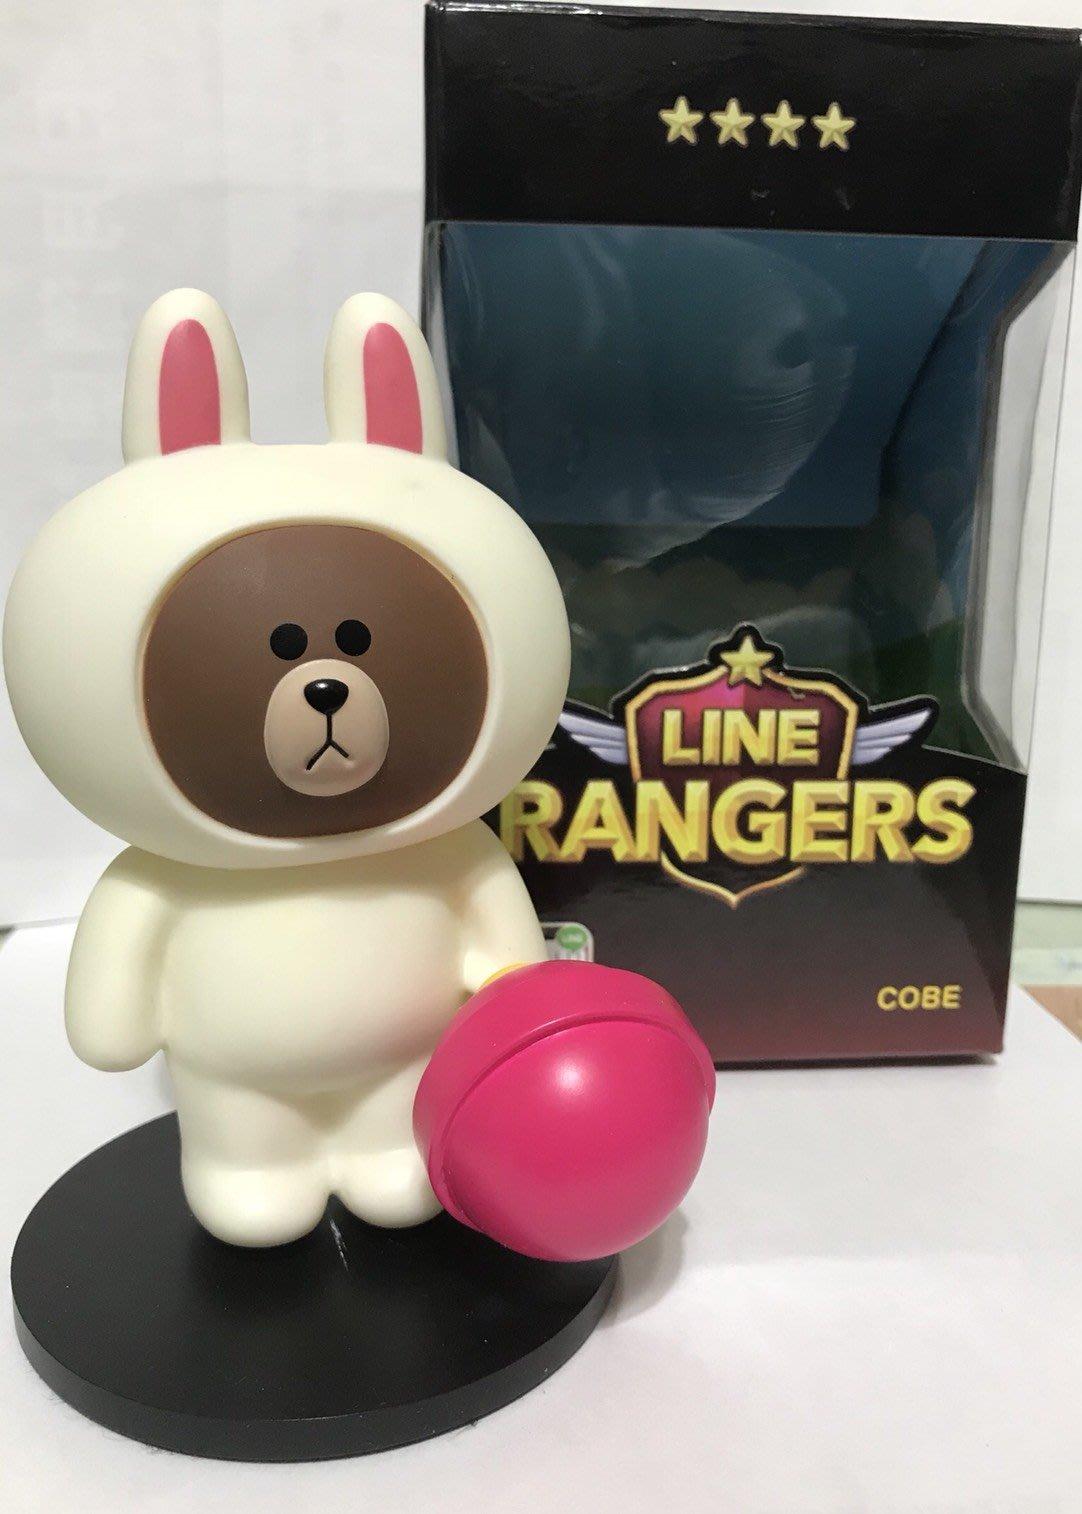 LINE RANGERS 限定版公仔 銀河特攻隊 COBE柯比 800元含運